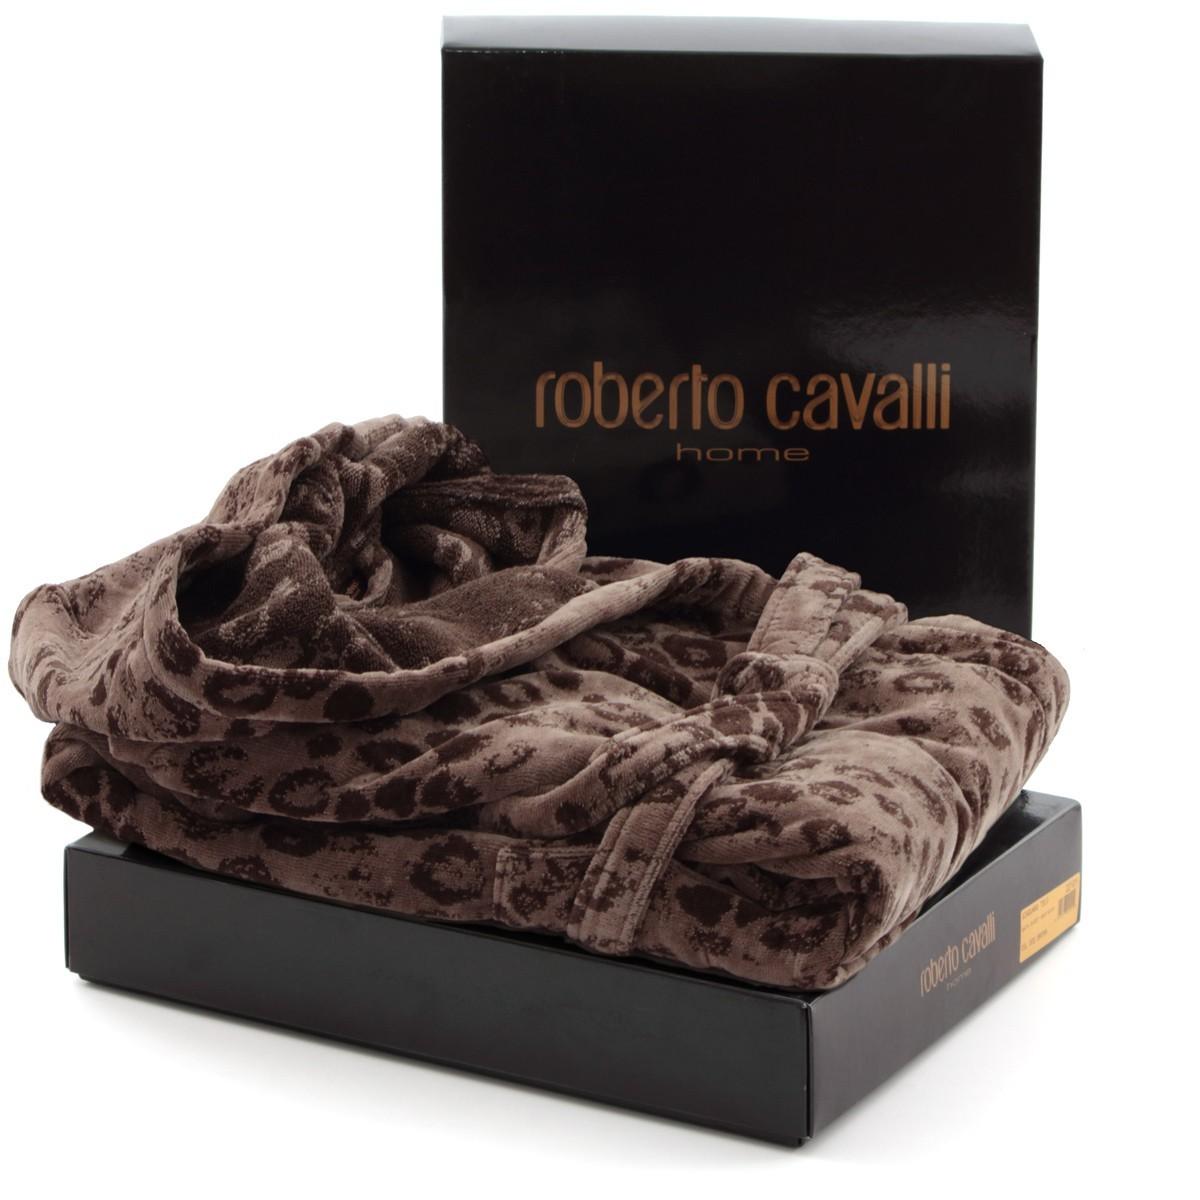 Халаты Элитный халат велюровый Giaguaro коричневый от Roberto Cavalli elitnyy-halat-velyurovyy-giaguaro-korichnevyy-ot-roberto-cavalli-italiya.jpg